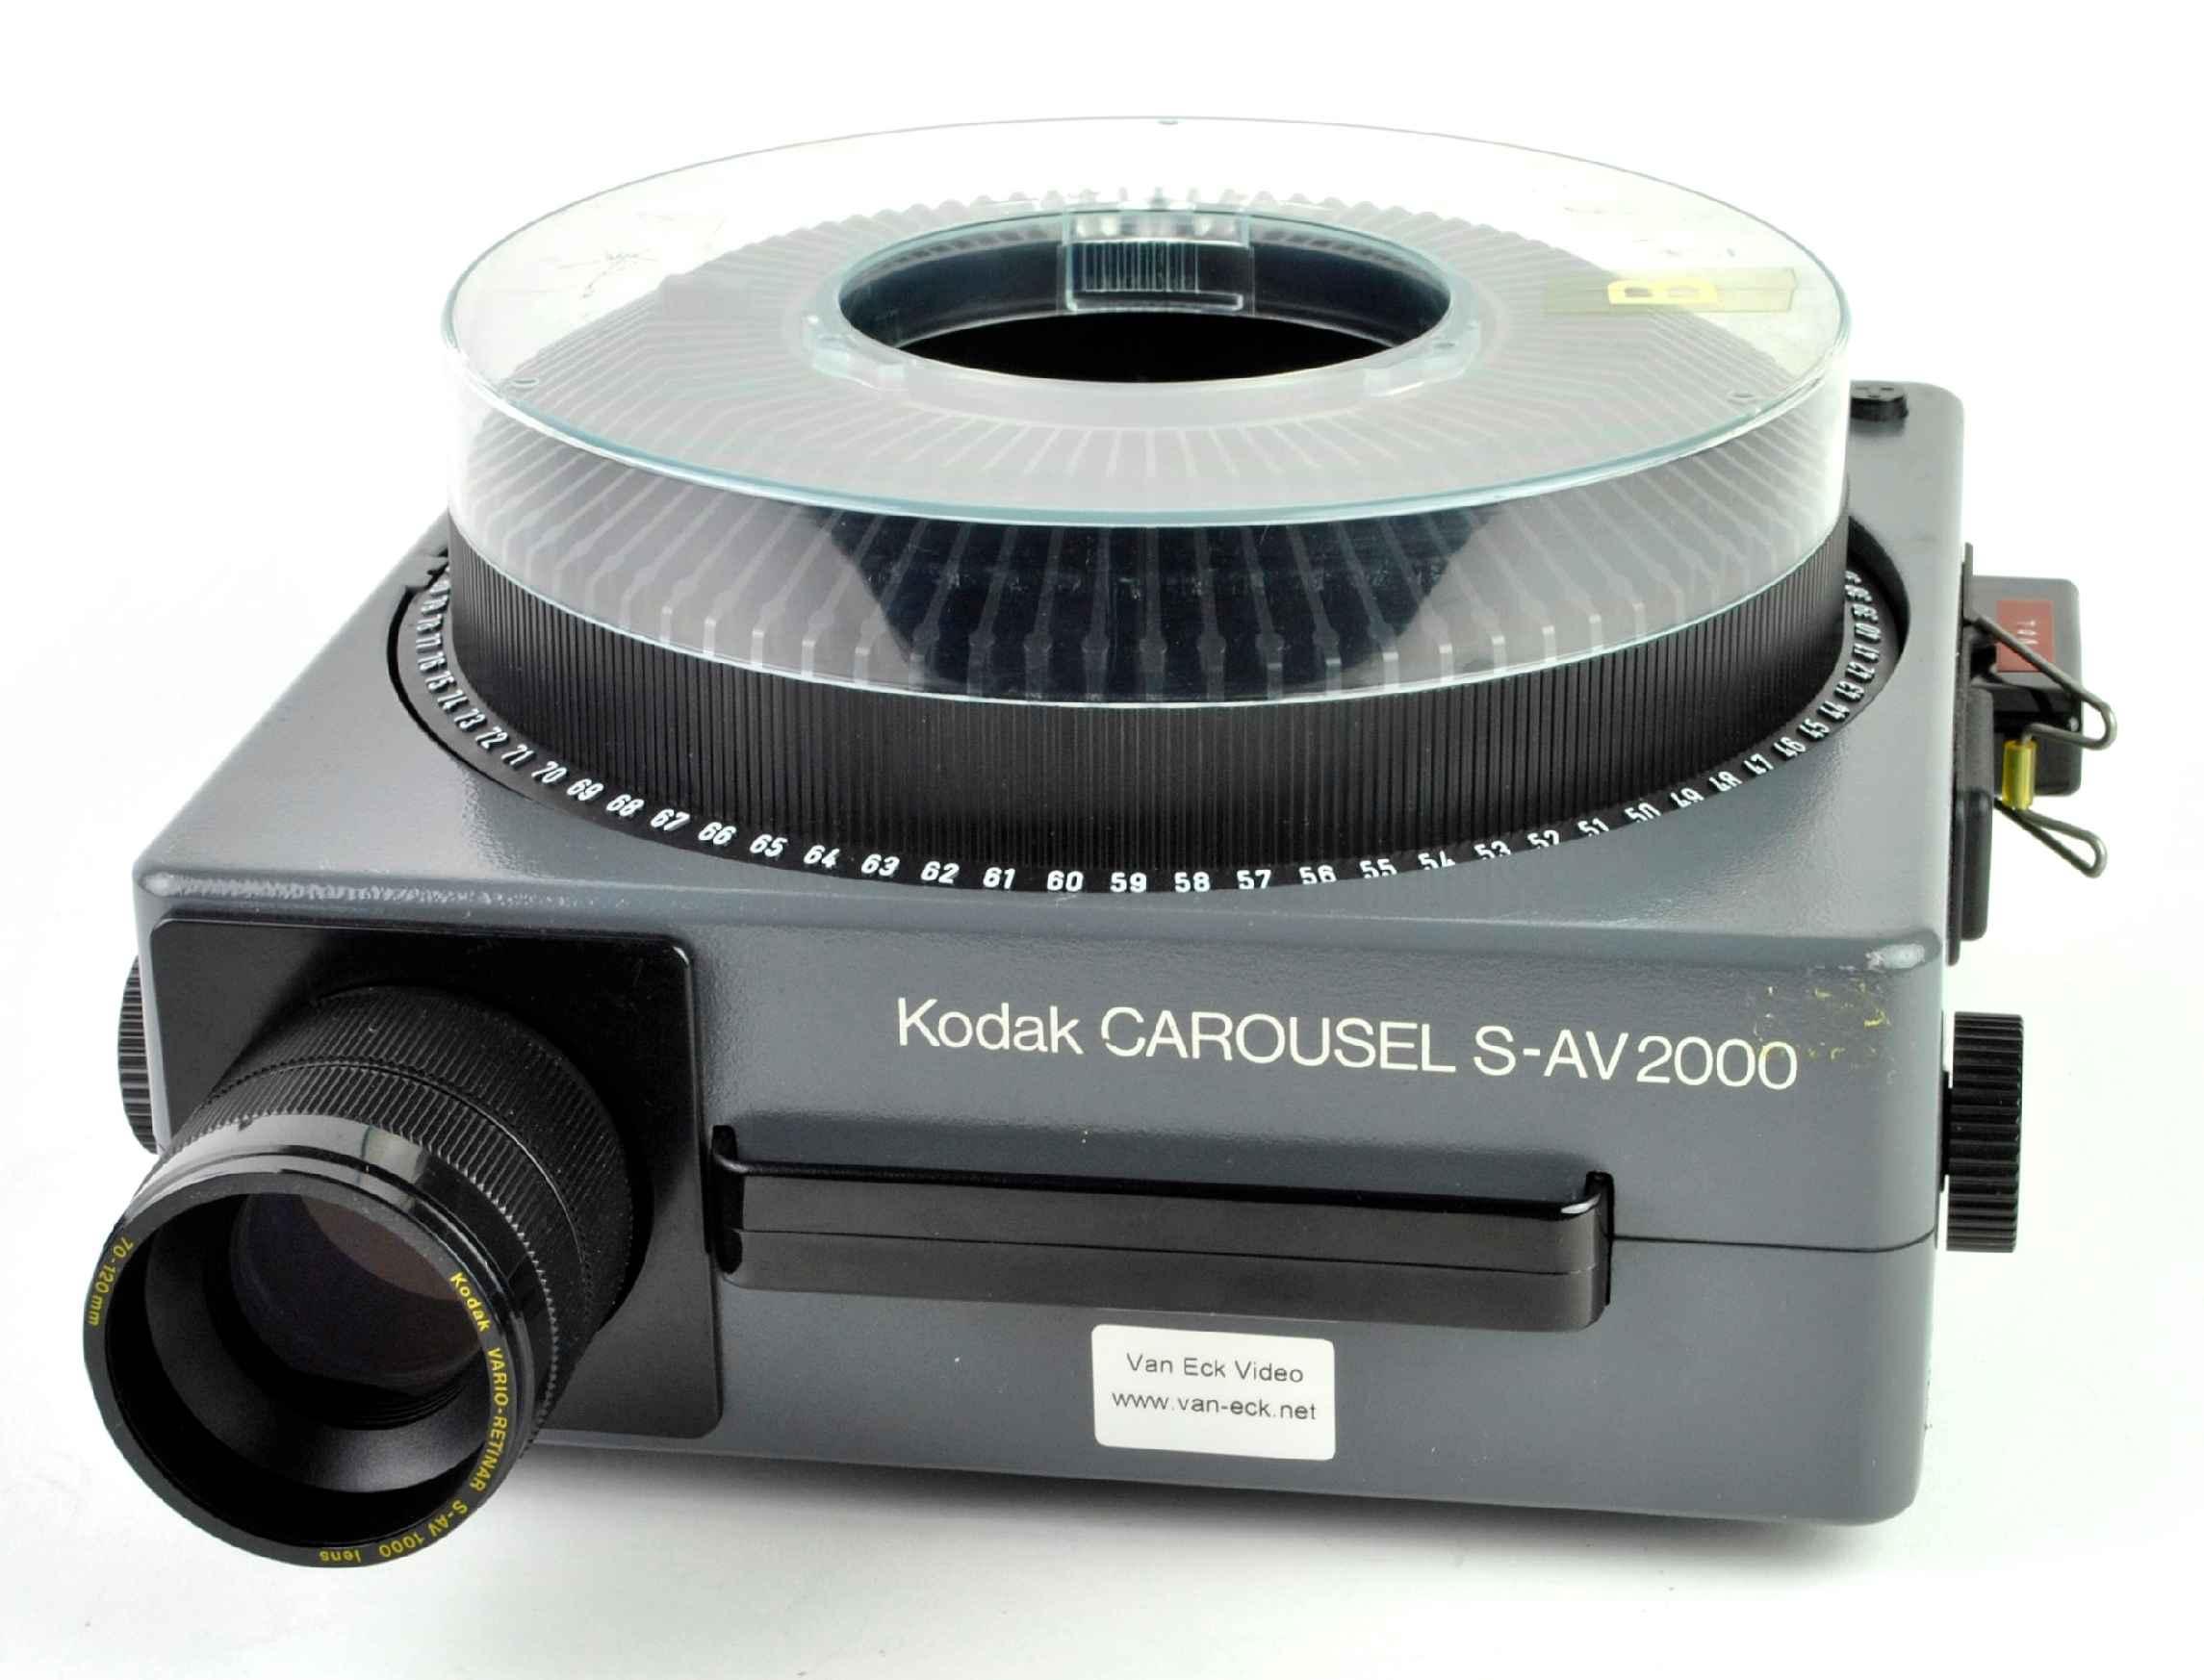 kodak carousel s av 2000 slide projectors spare parts and rh van eck net Powerful Laser Pointer Powerful Laser Pointer